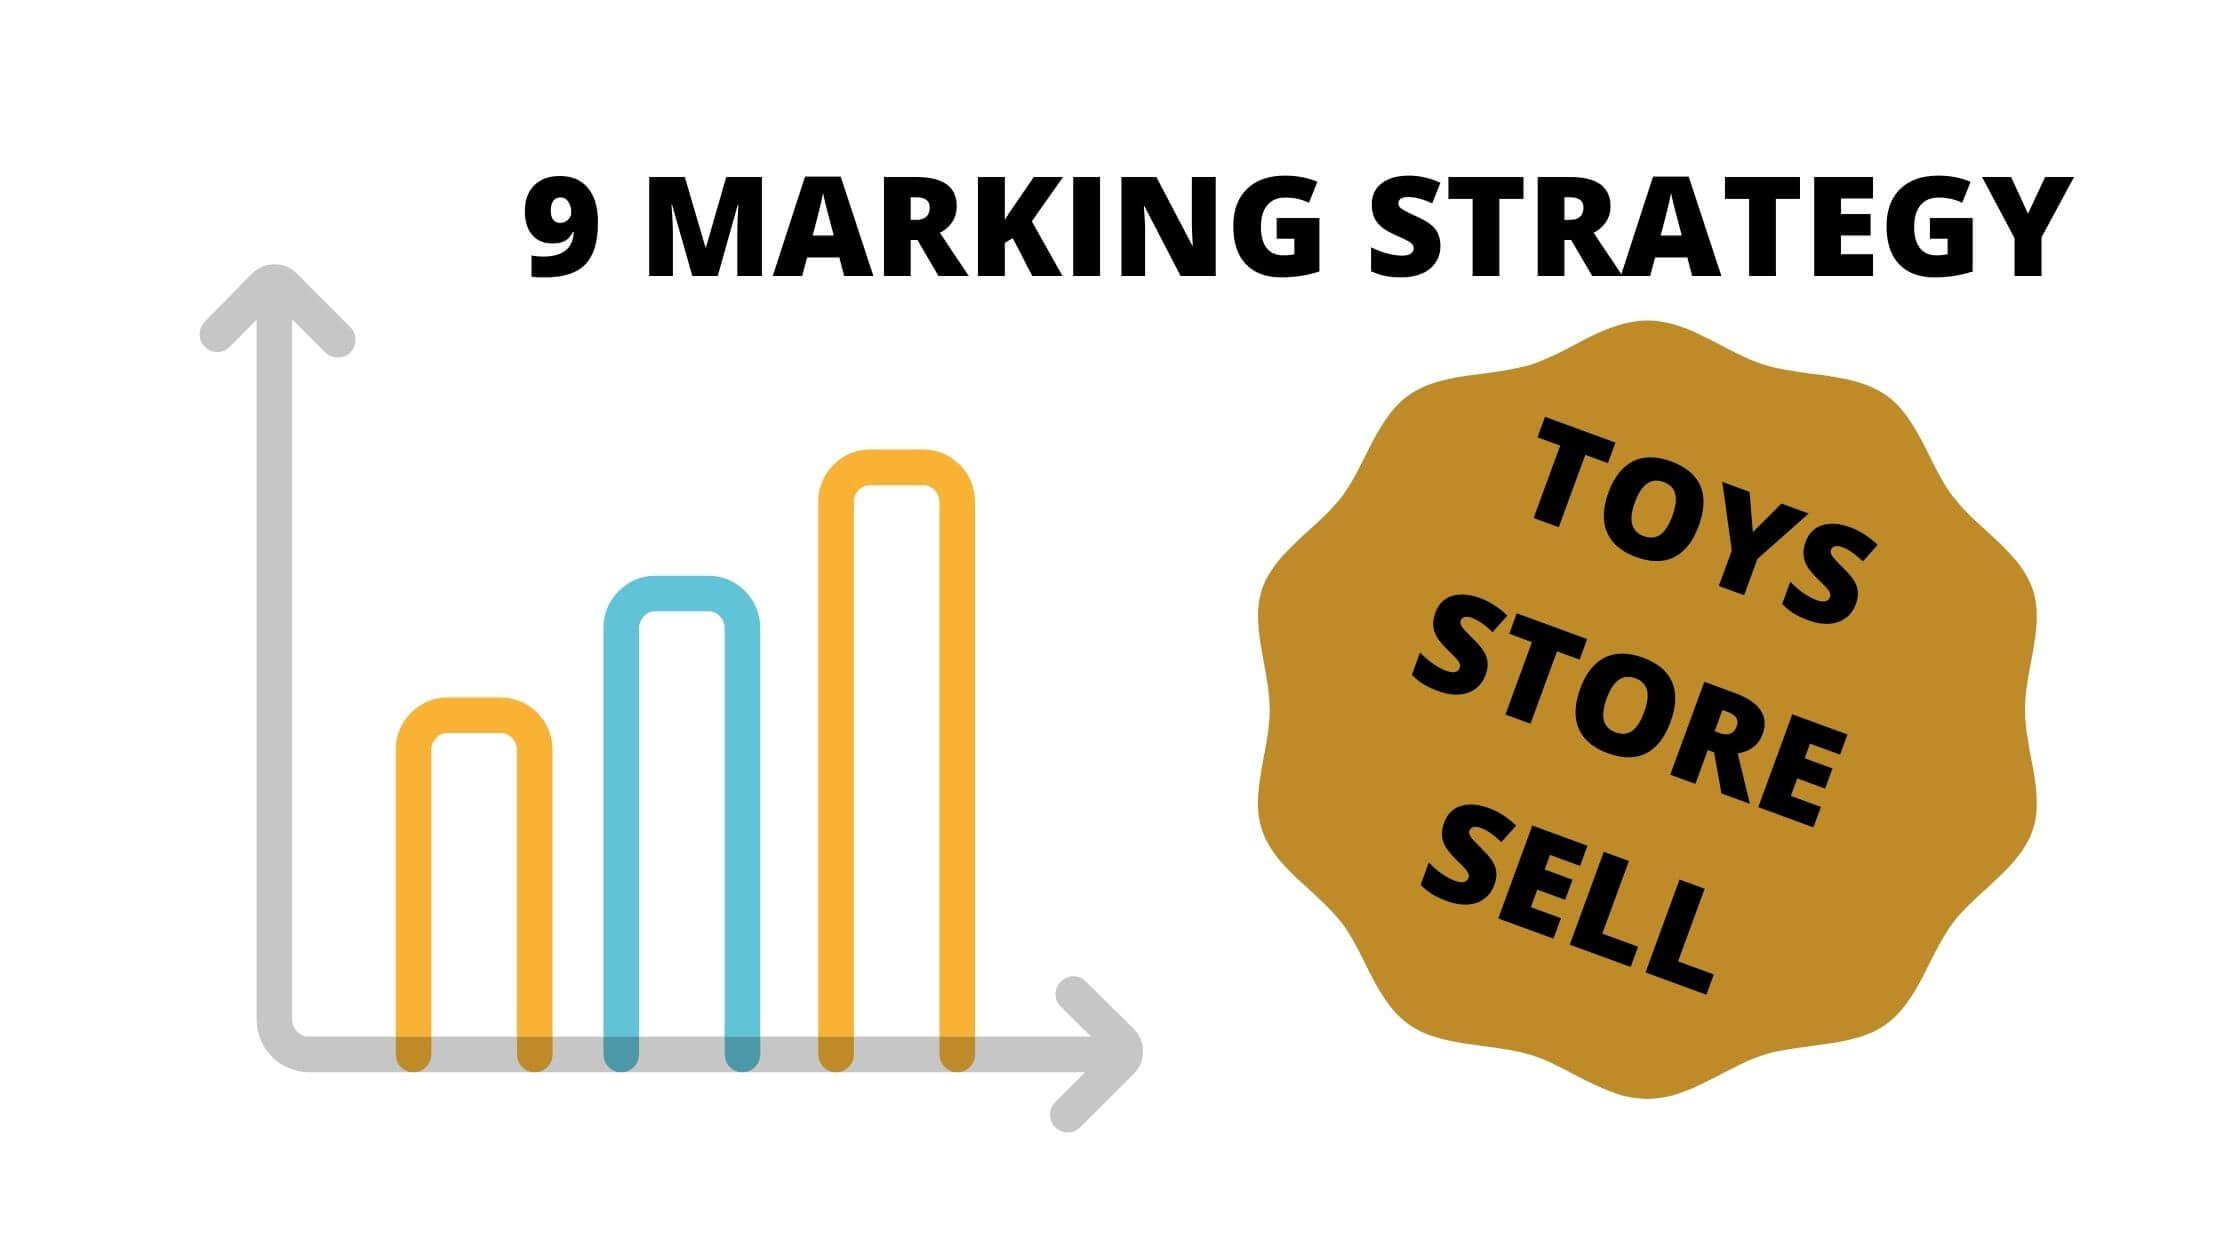 9 MARKING STRATEGY